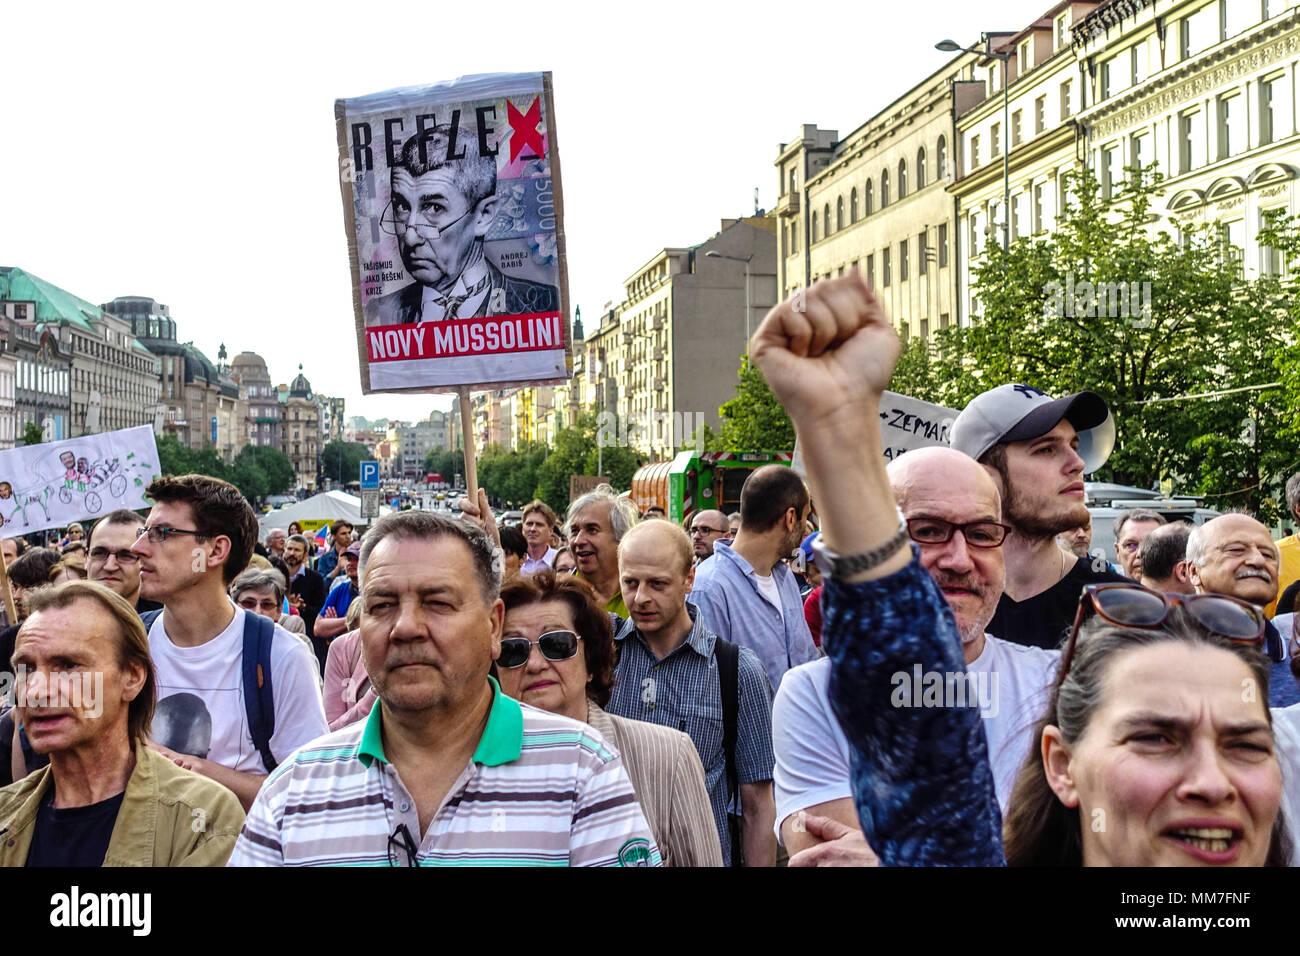 Prague, Czech Republic. 9th May, 2018. Demonstration against Premier Babis, President Zeman and the Communists Credit: Radim Beznoska/Alamy Live News - Stock Image